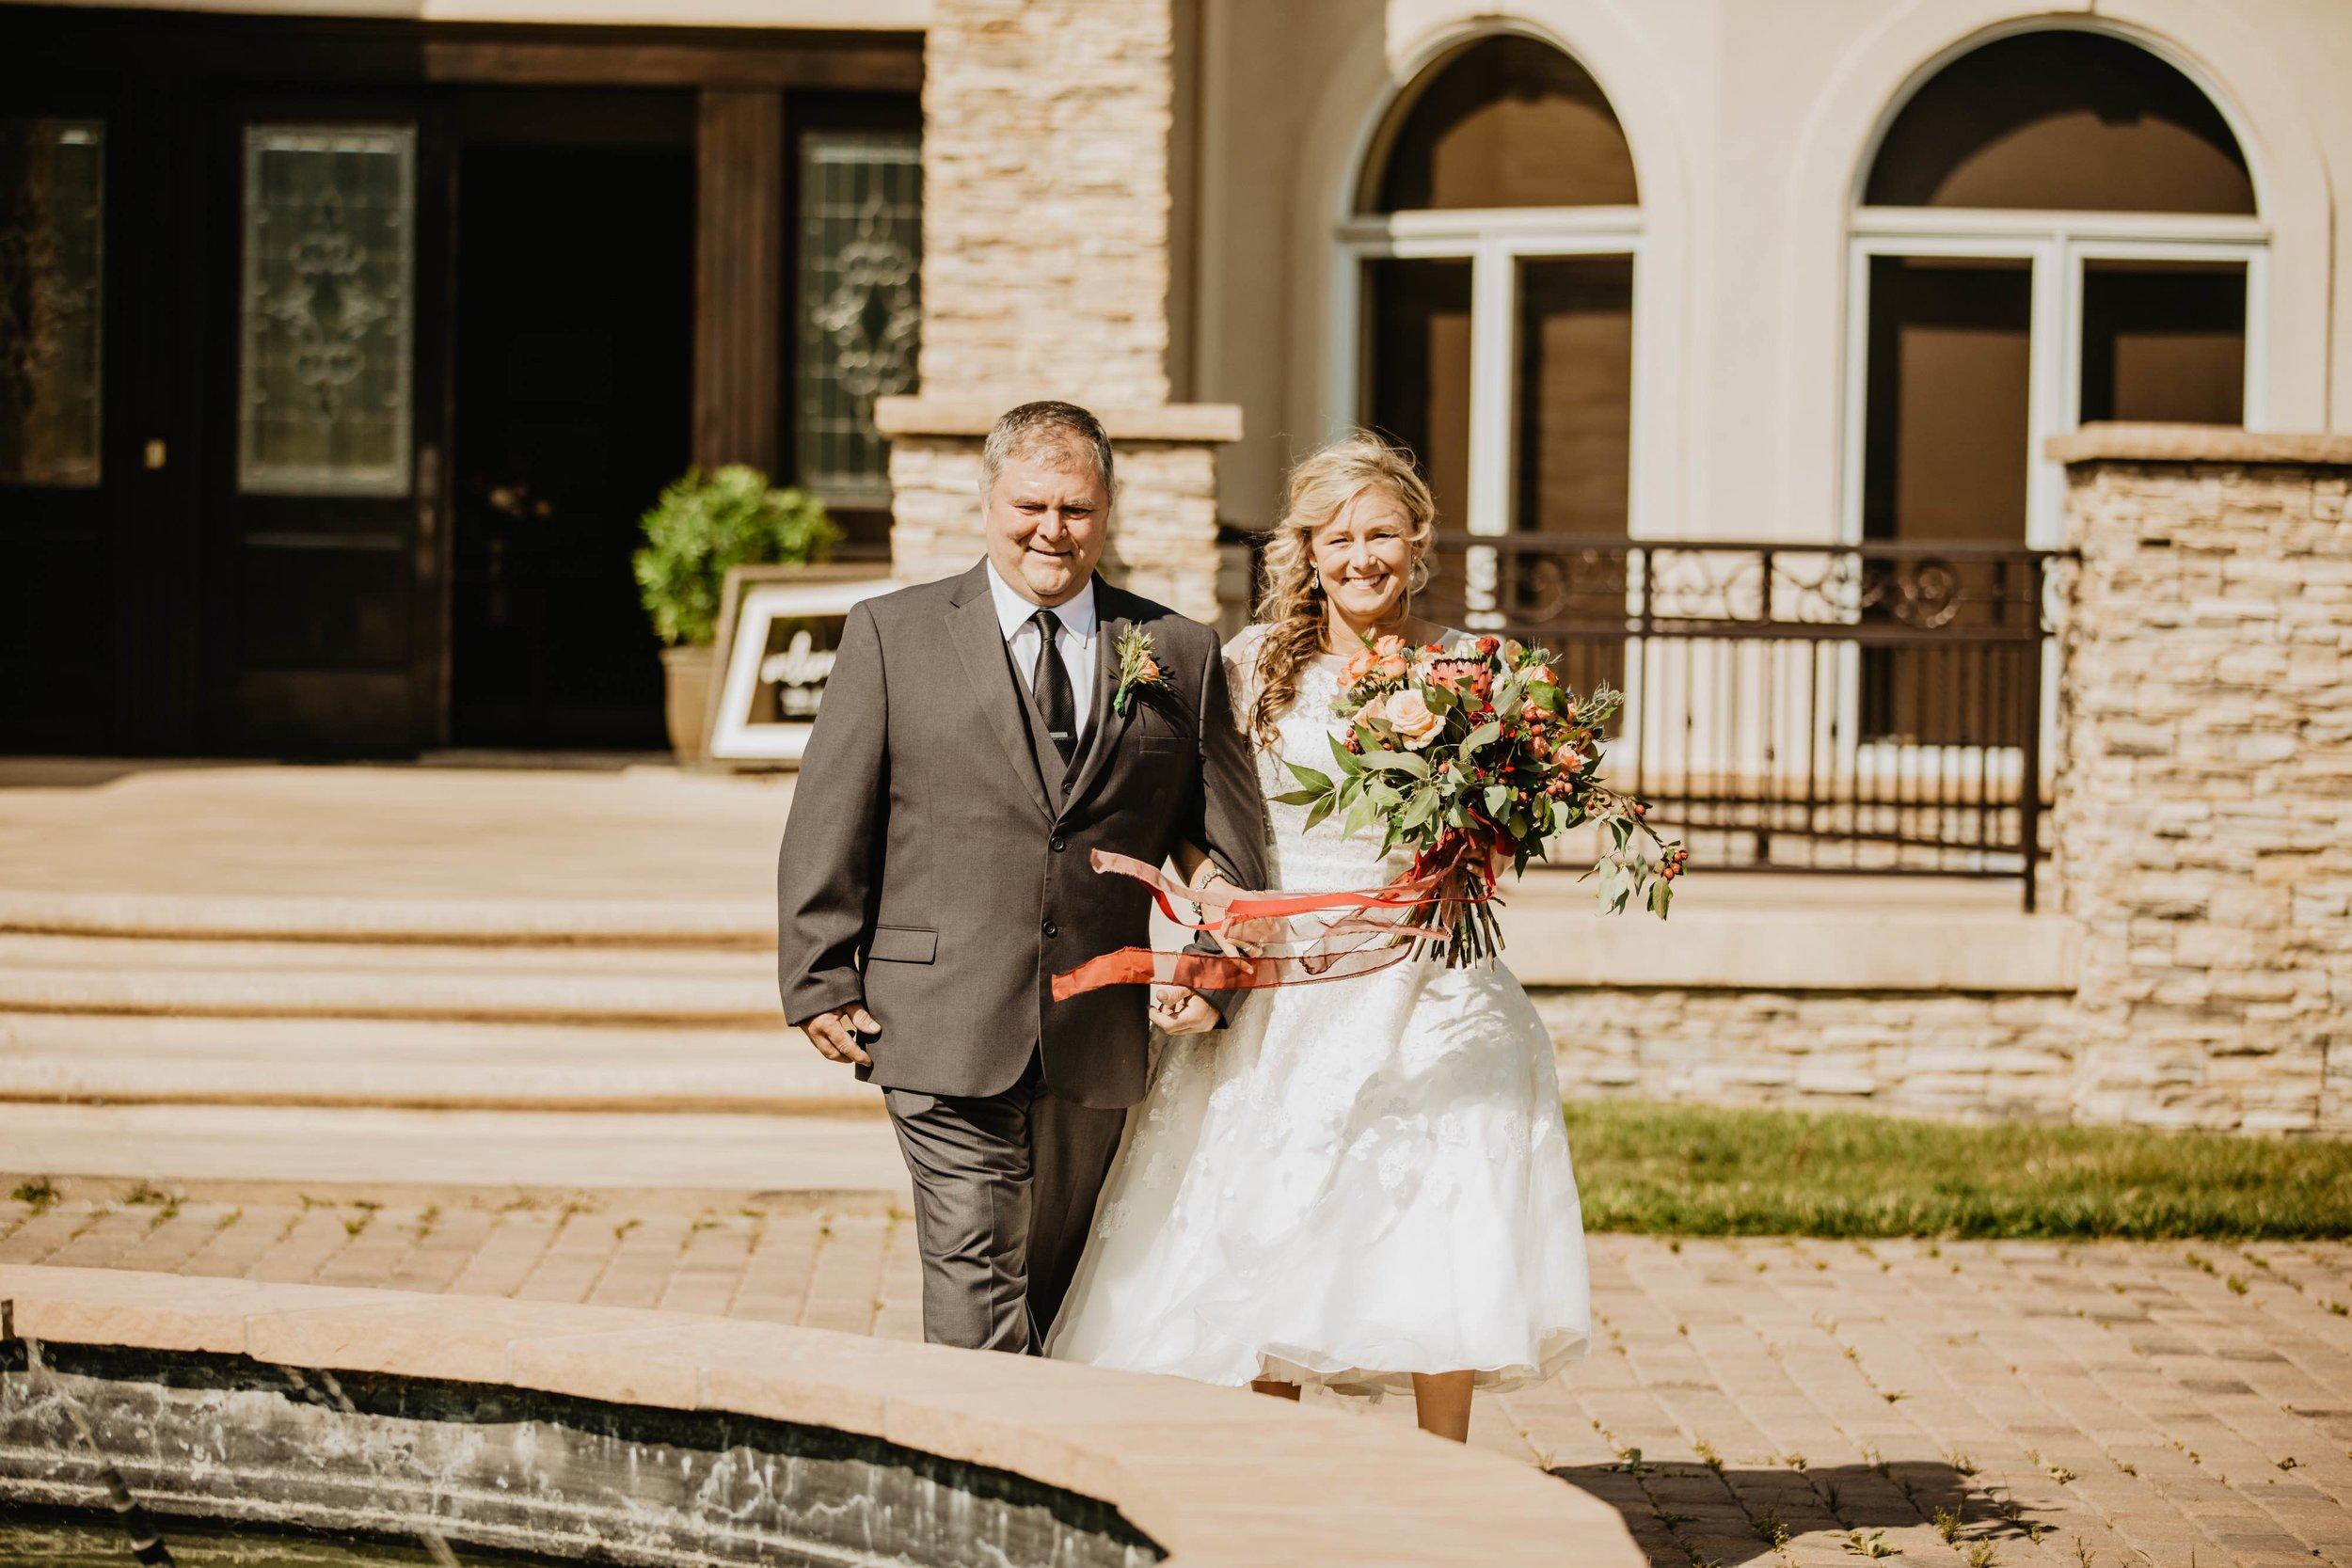 Kisa Conrad Favorites-0006-colorado-wedding-photographer-denver-springs-vail.jpeg